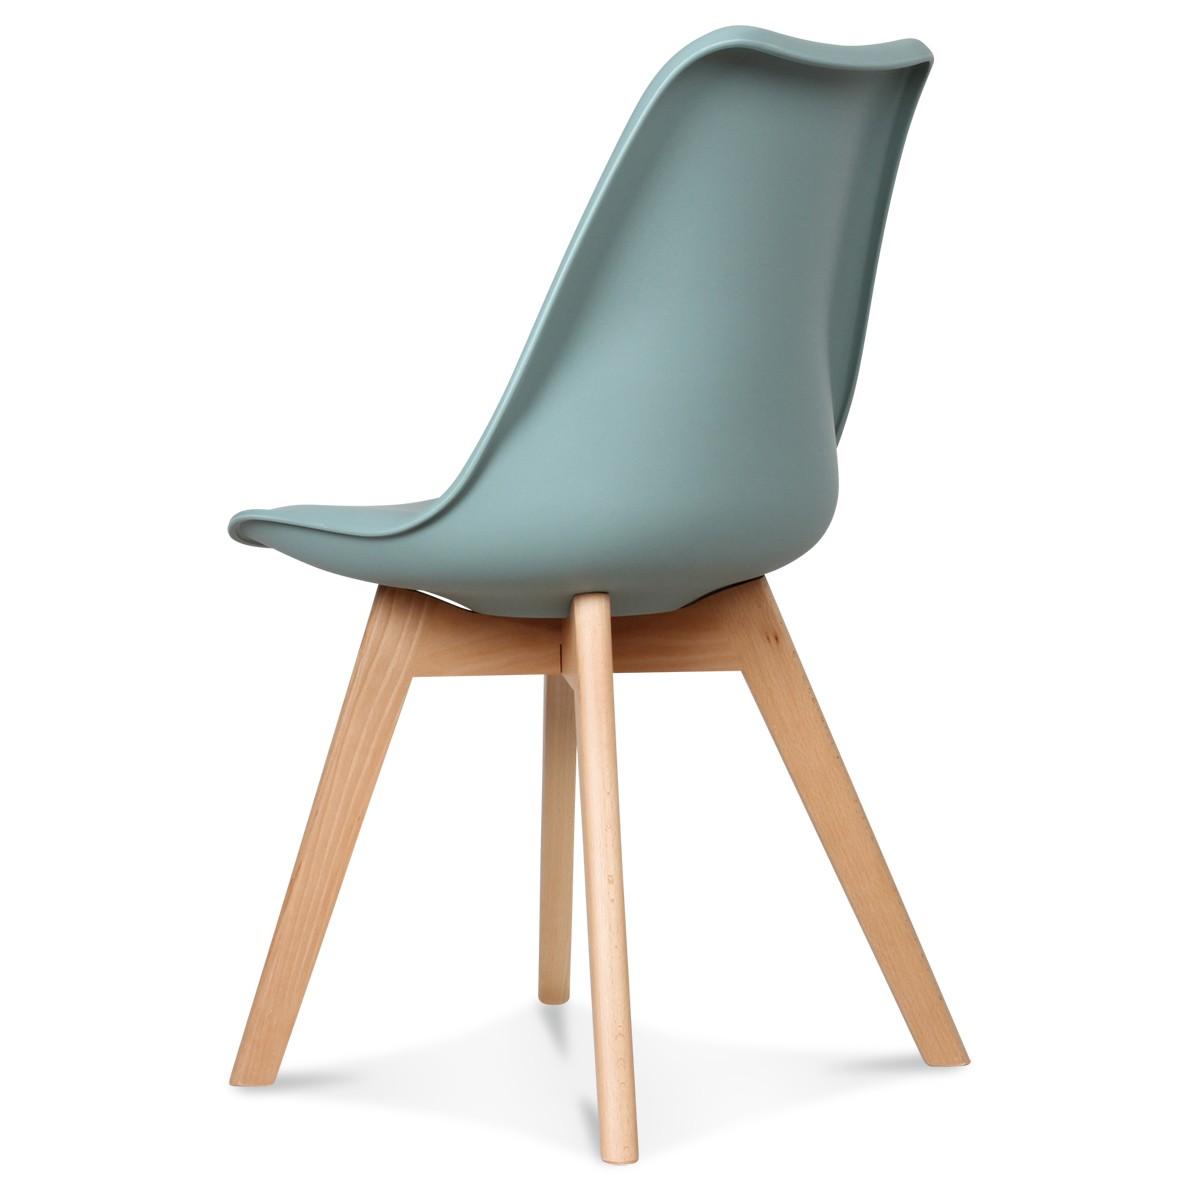 chaise design scandinave vert thym scandy couleur vert. Black Bedroom Furniture Sets. Home Design Ideas